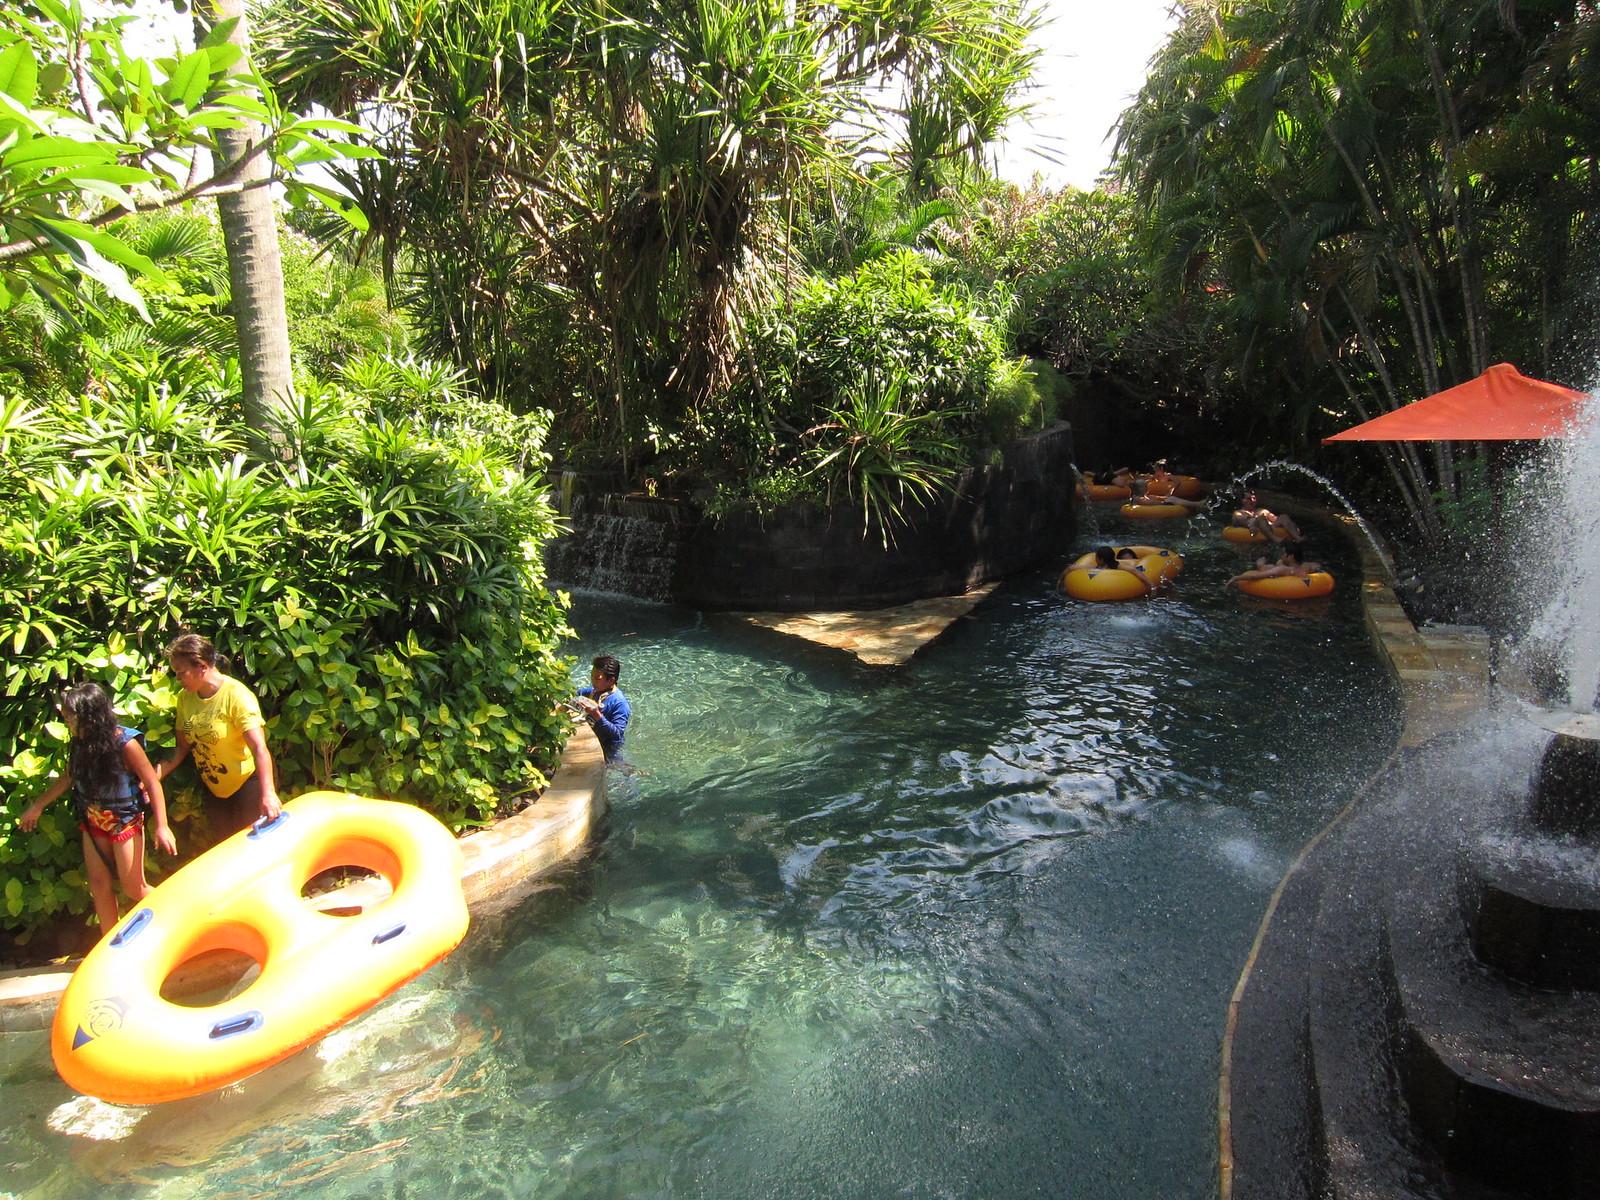 Bali Waterbom Park, Kuta